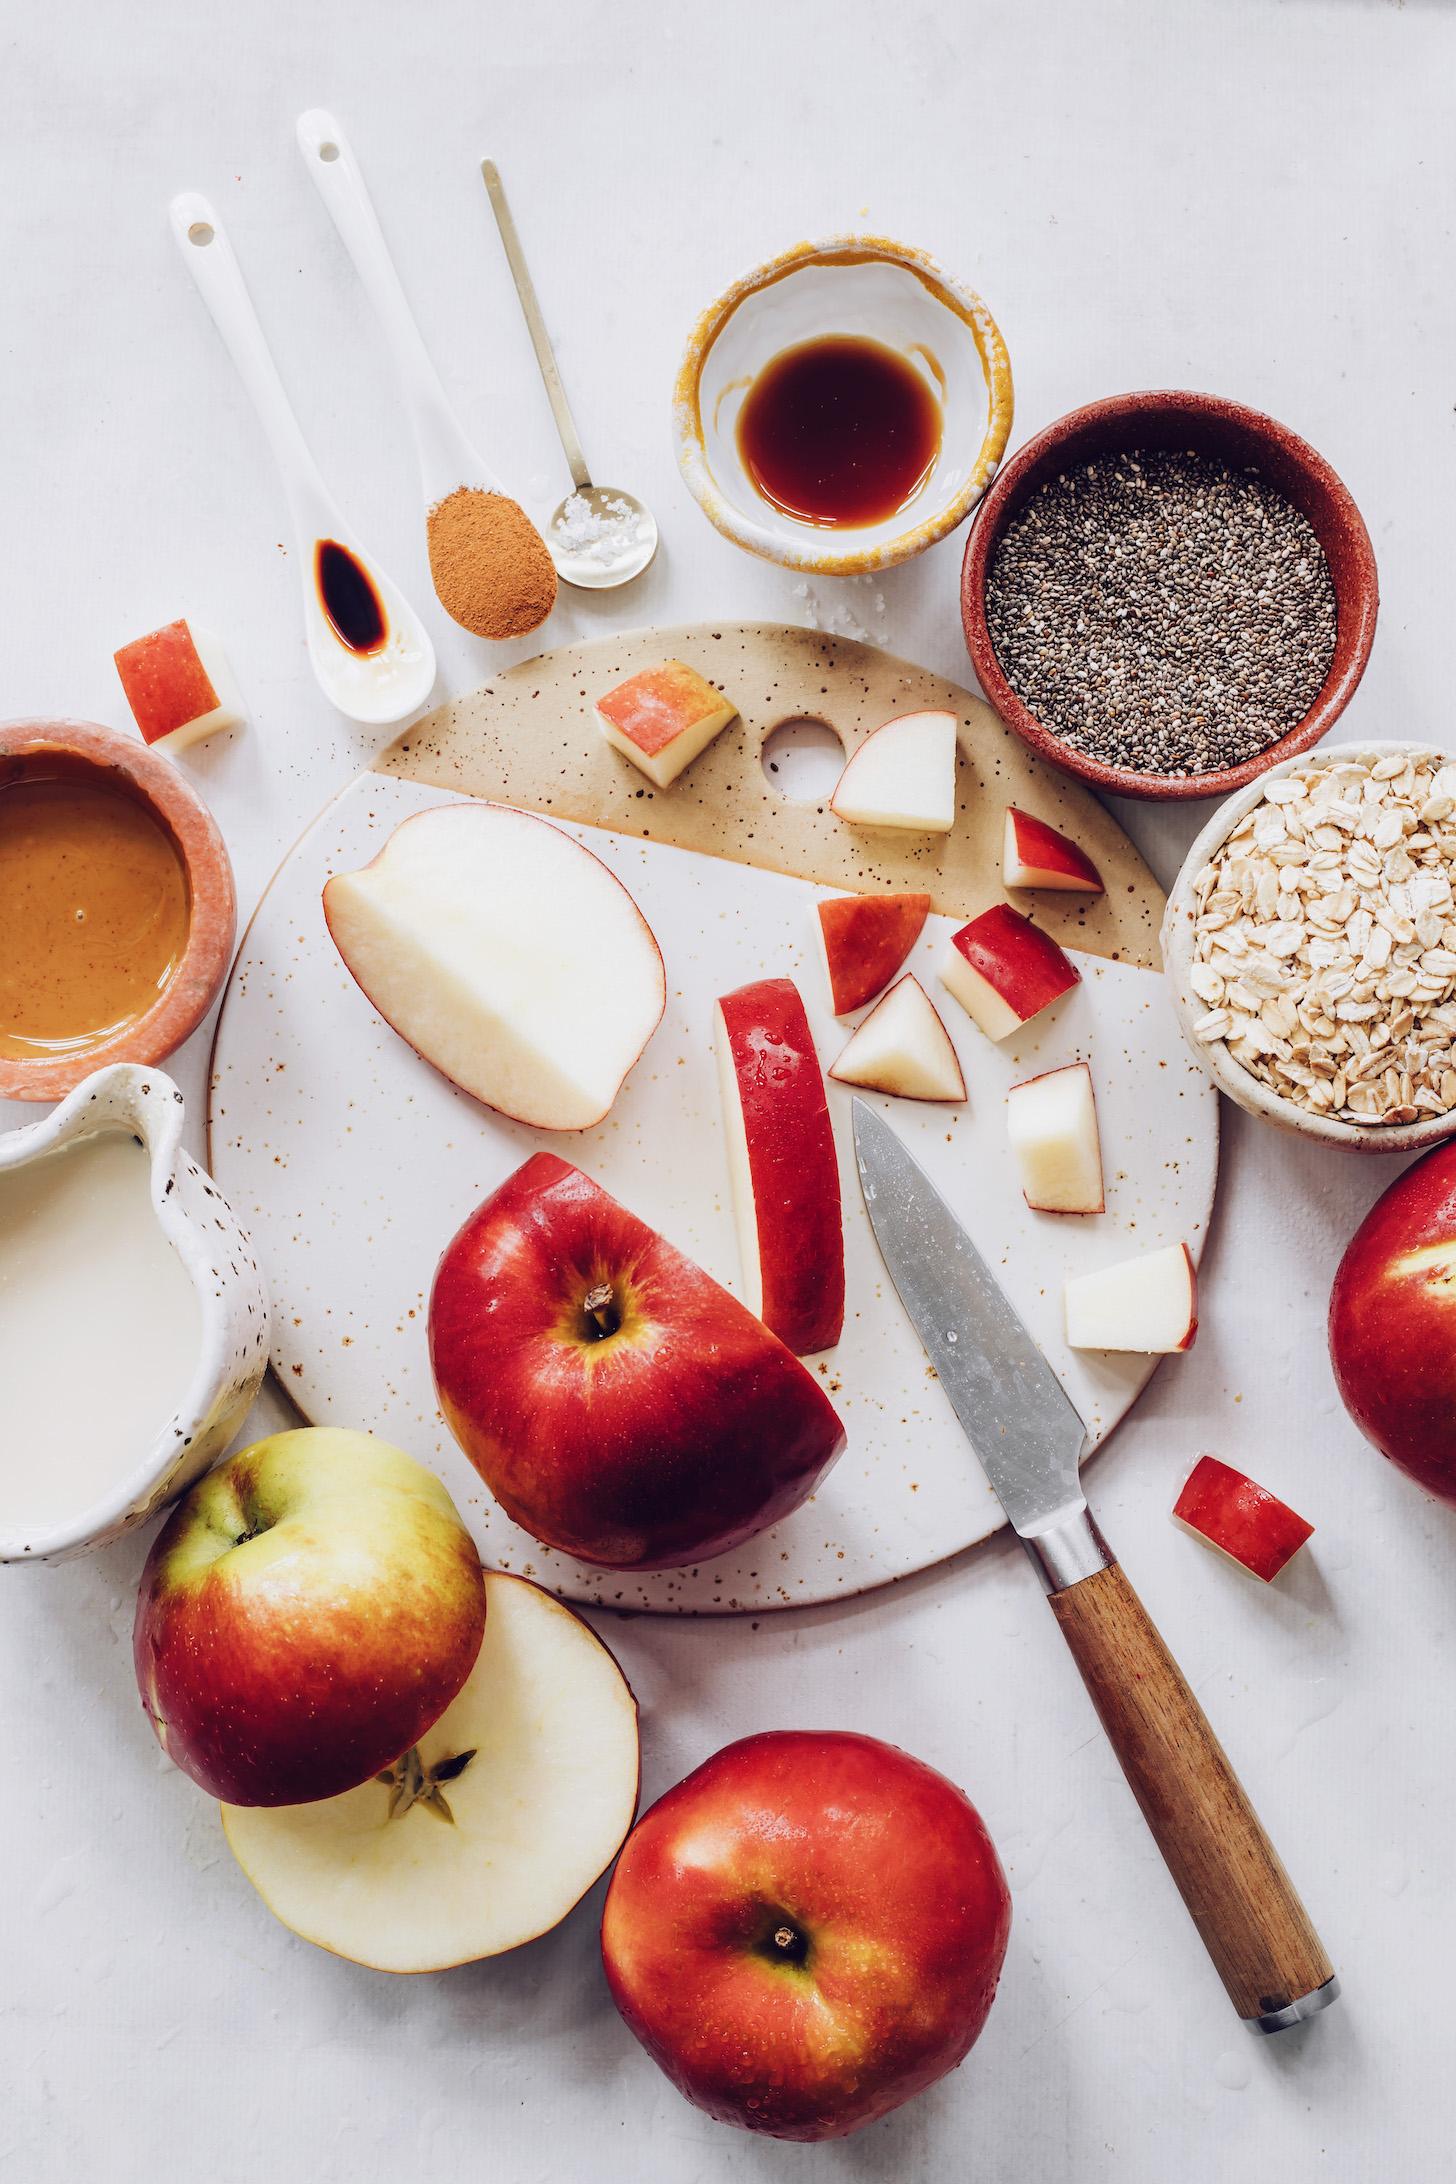 Apples, cinnamon, maple syrup, sea salt, almond milk, chia seeds, almond butter, vanilla, and oats